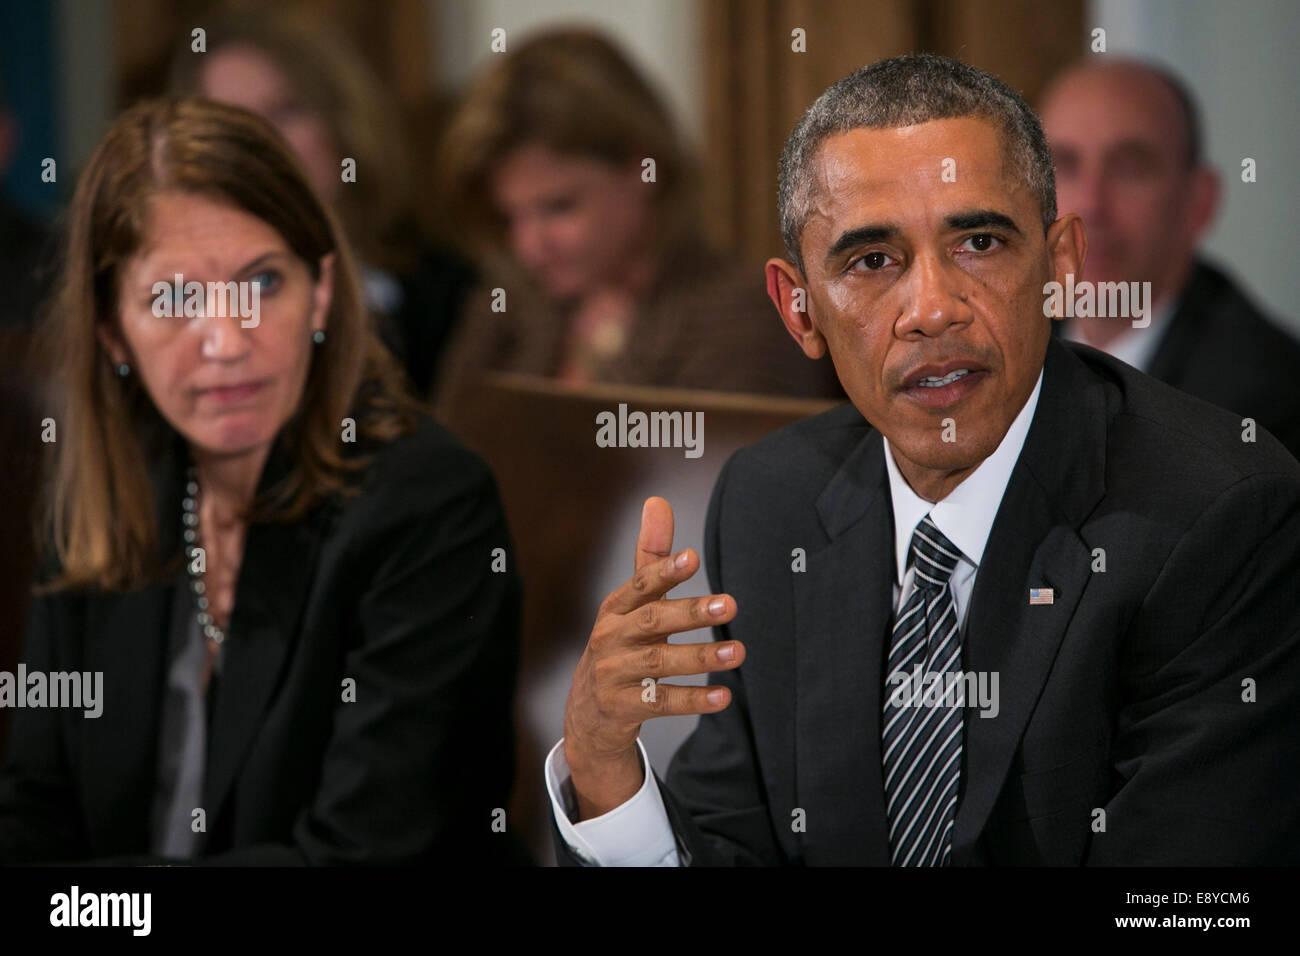 Washington, DC, USA. 15th Oct, 2014. United States President Barack Obama delivers remarks during a cabinet level Stock Photo